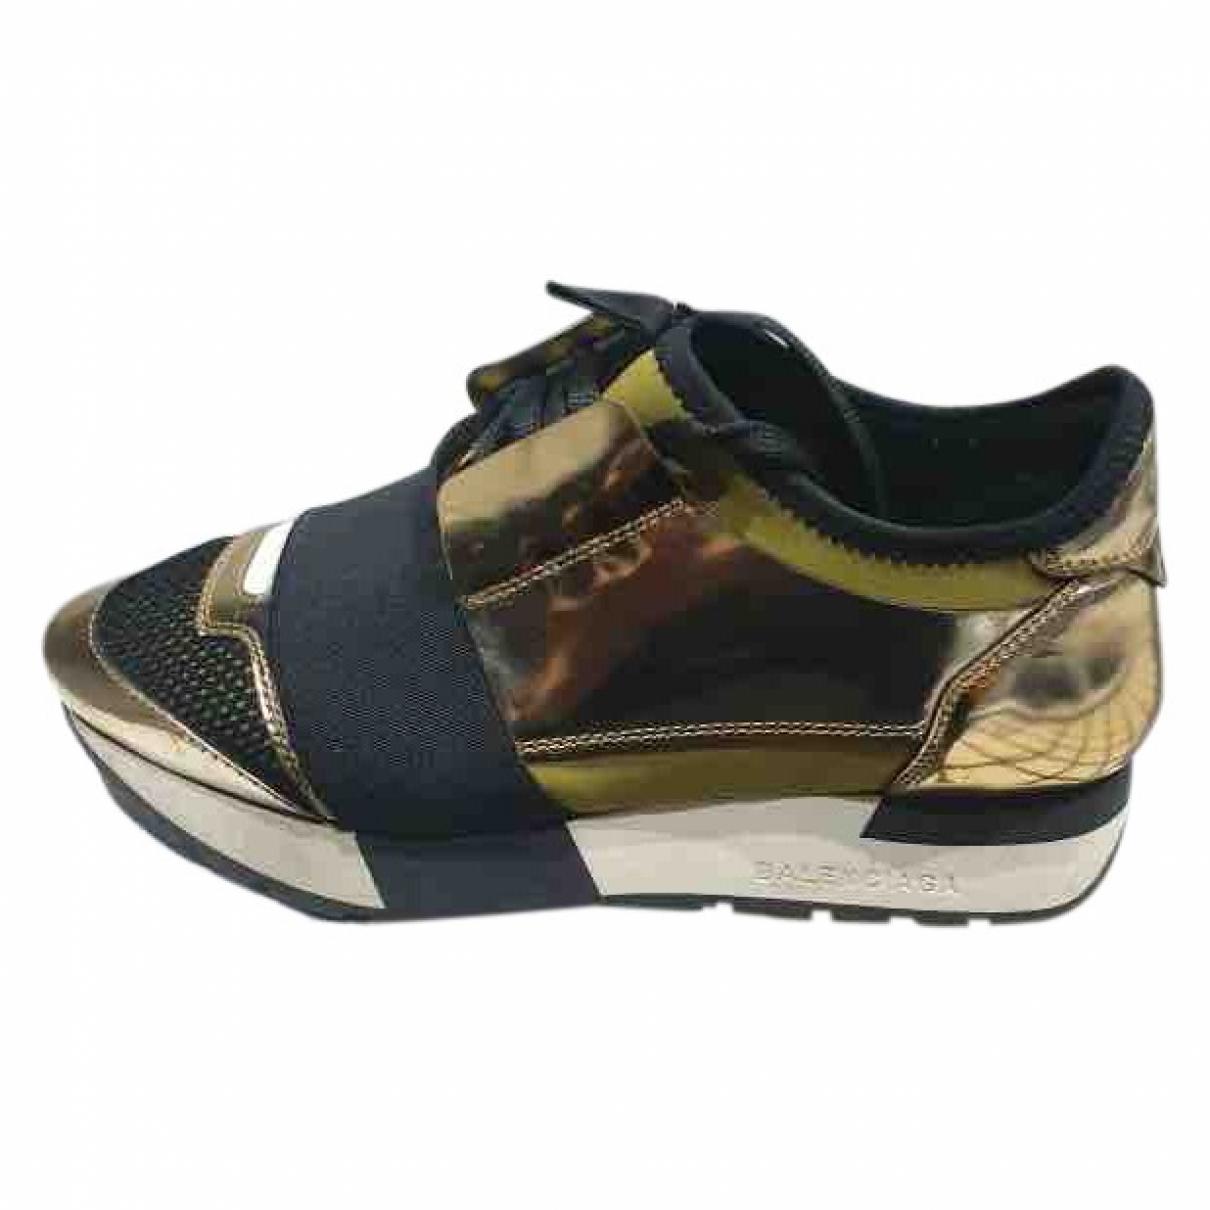 Balenciaga Race Gold Patent leather Trainers for Women 36 EU